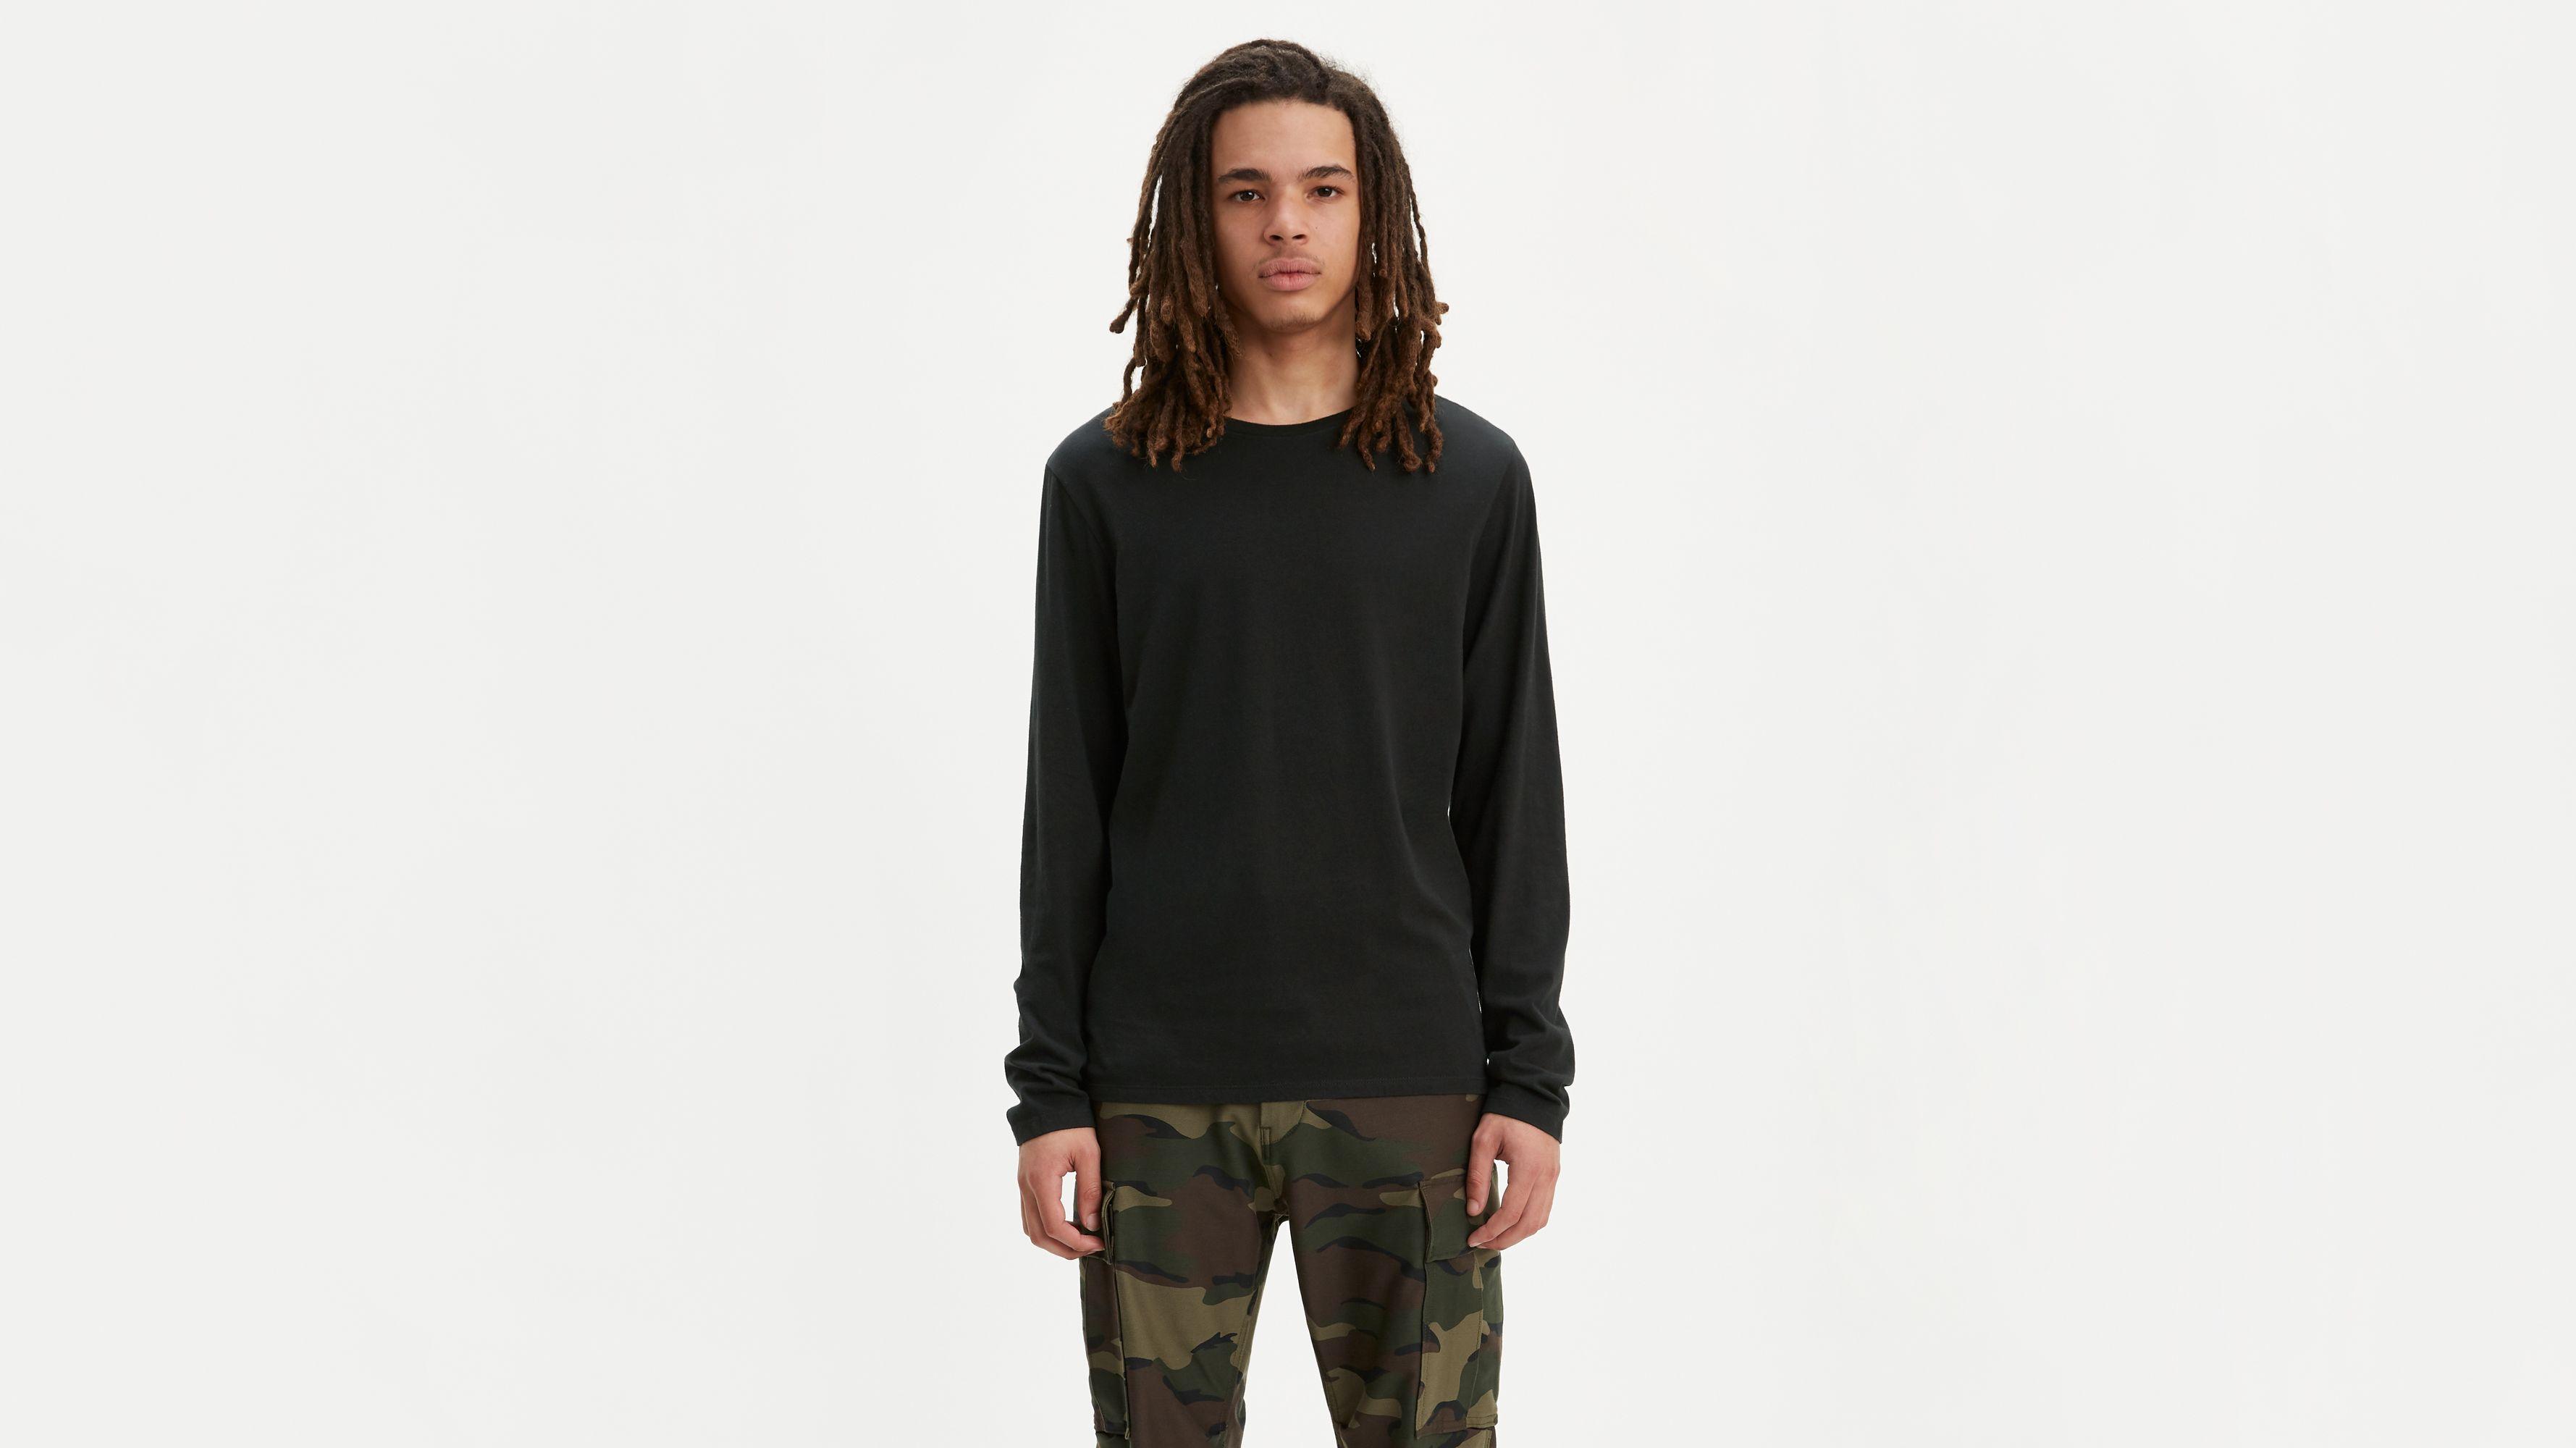 Longsleeve Slim Fit Crewneck Tee Shirt (2-Pack)